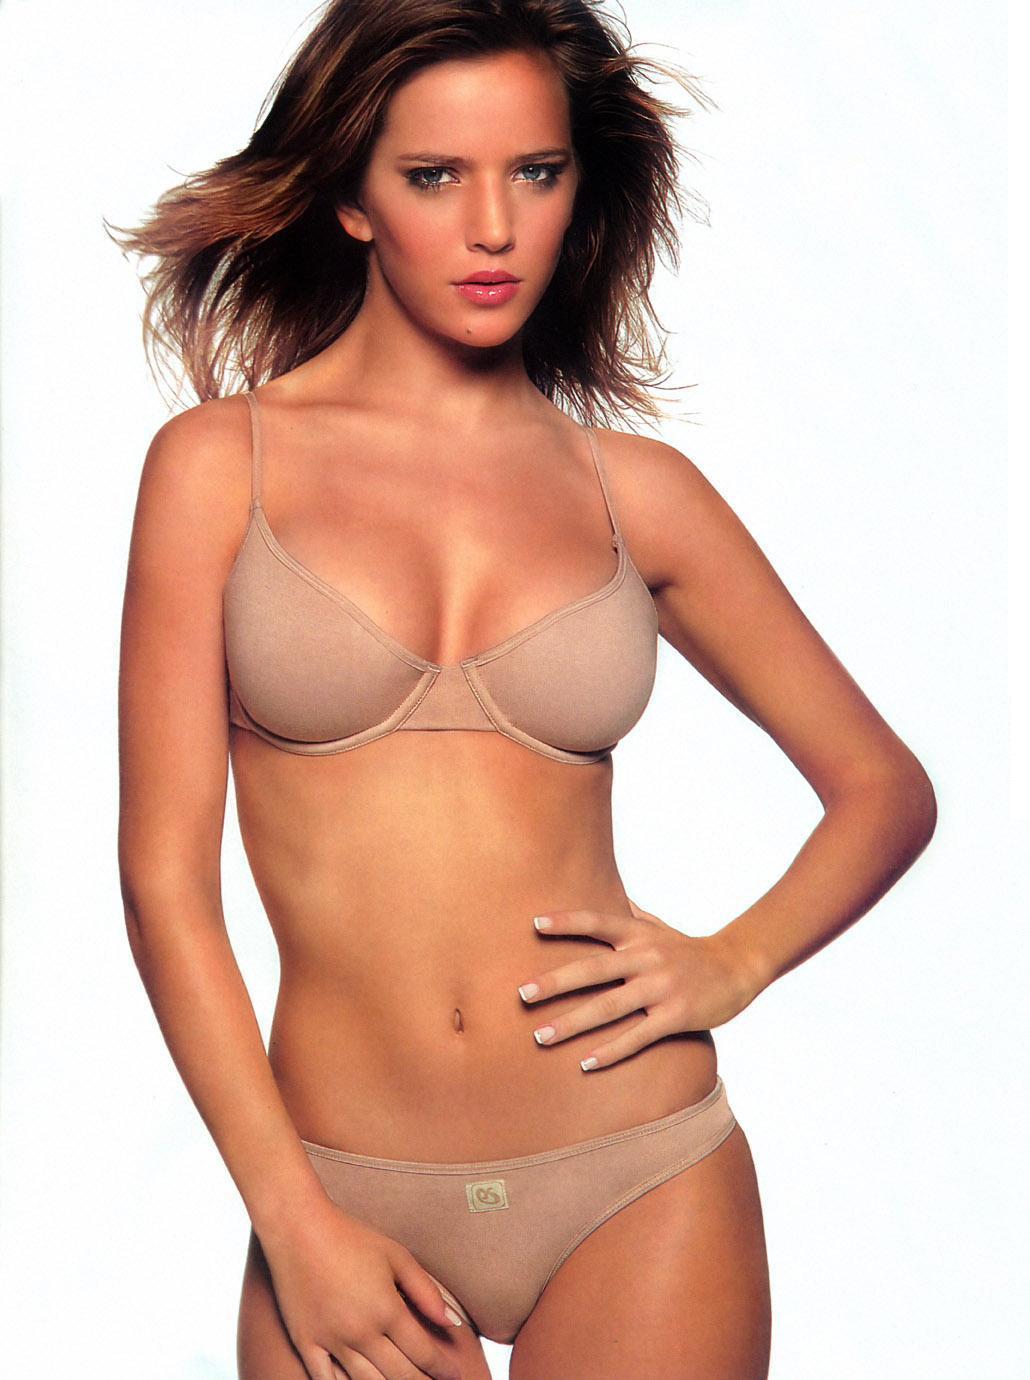 COK Bikini pics luisana lopilato